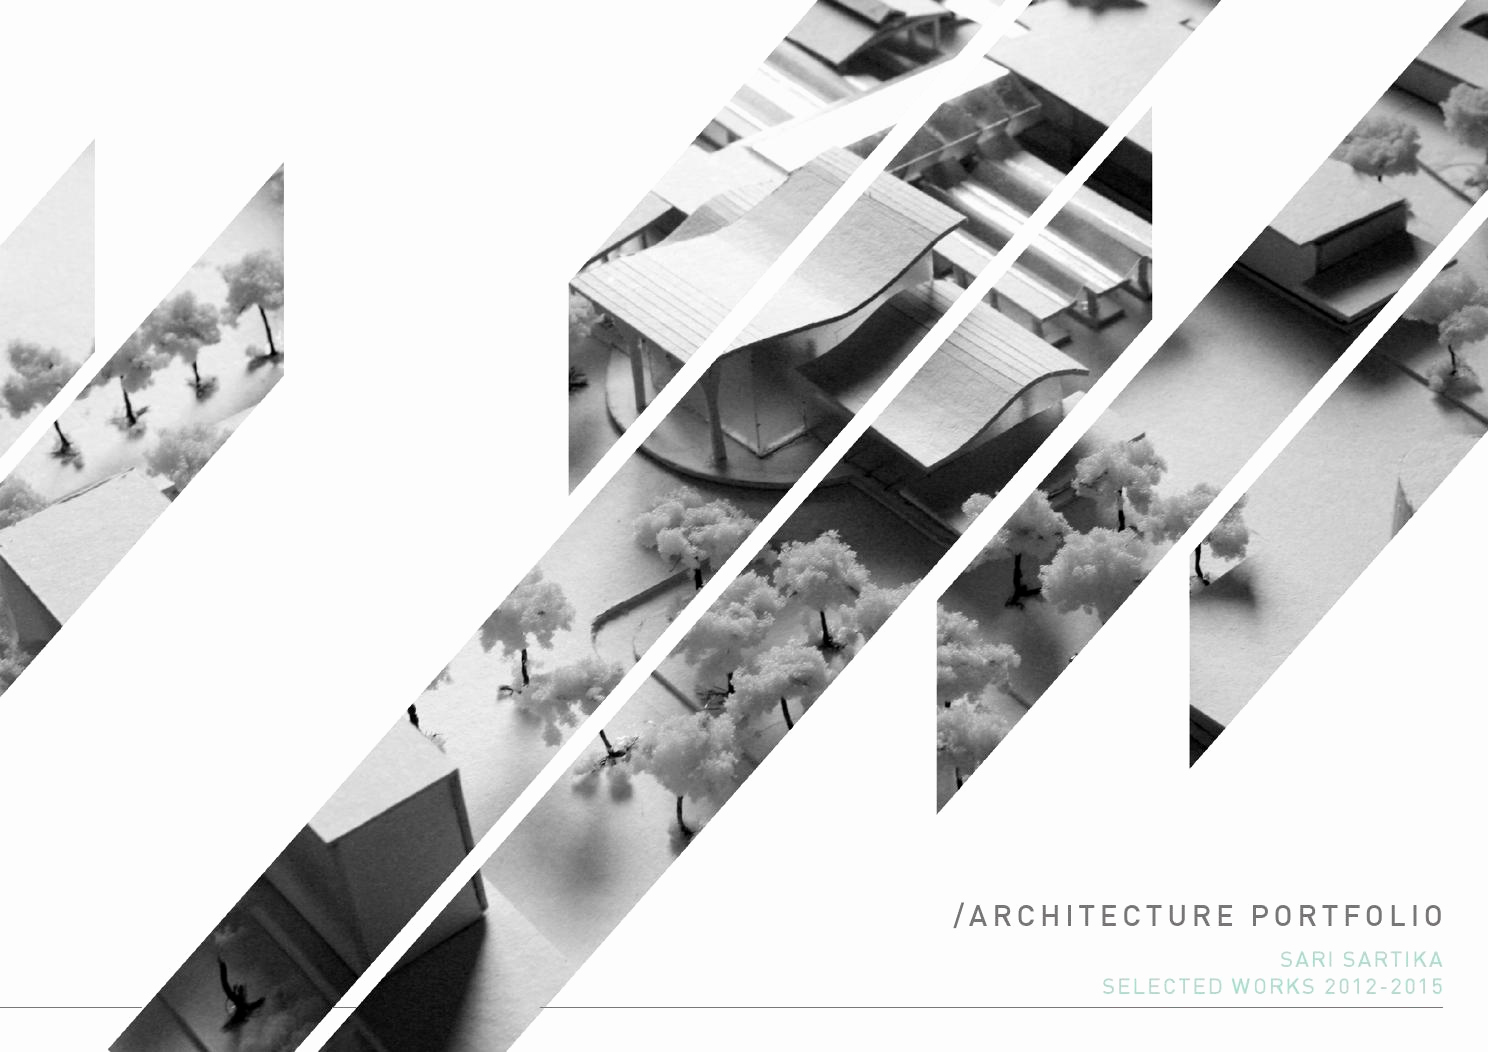 Portfolio Cover Page Template New Architecture Portfolio by Sari Sartika issuu